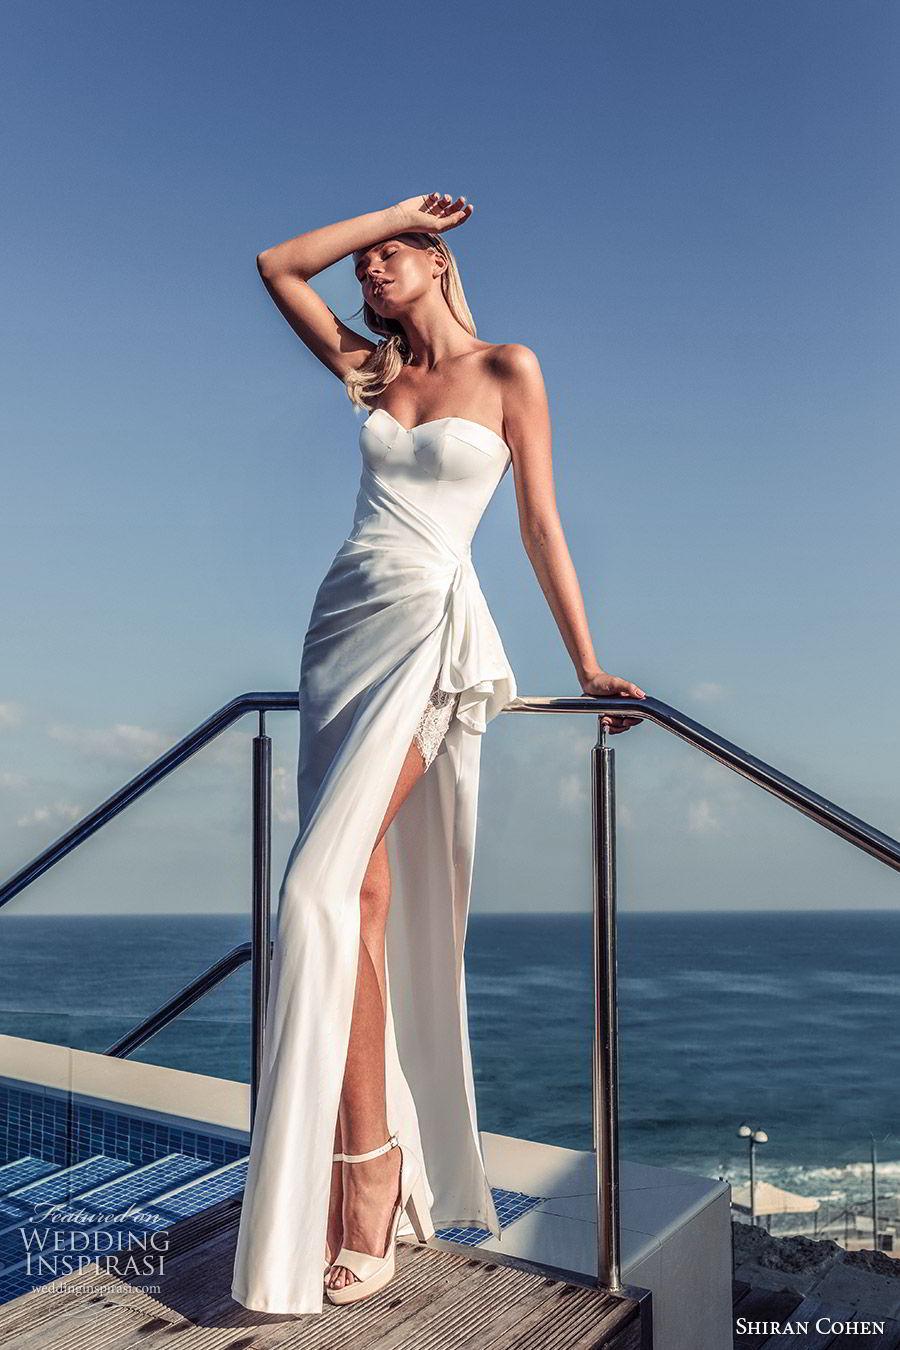 shiran cohen 2019 bridal strapless sweetheart minimally embellished sheath wedding dress side slit clean modern chic (4) mv